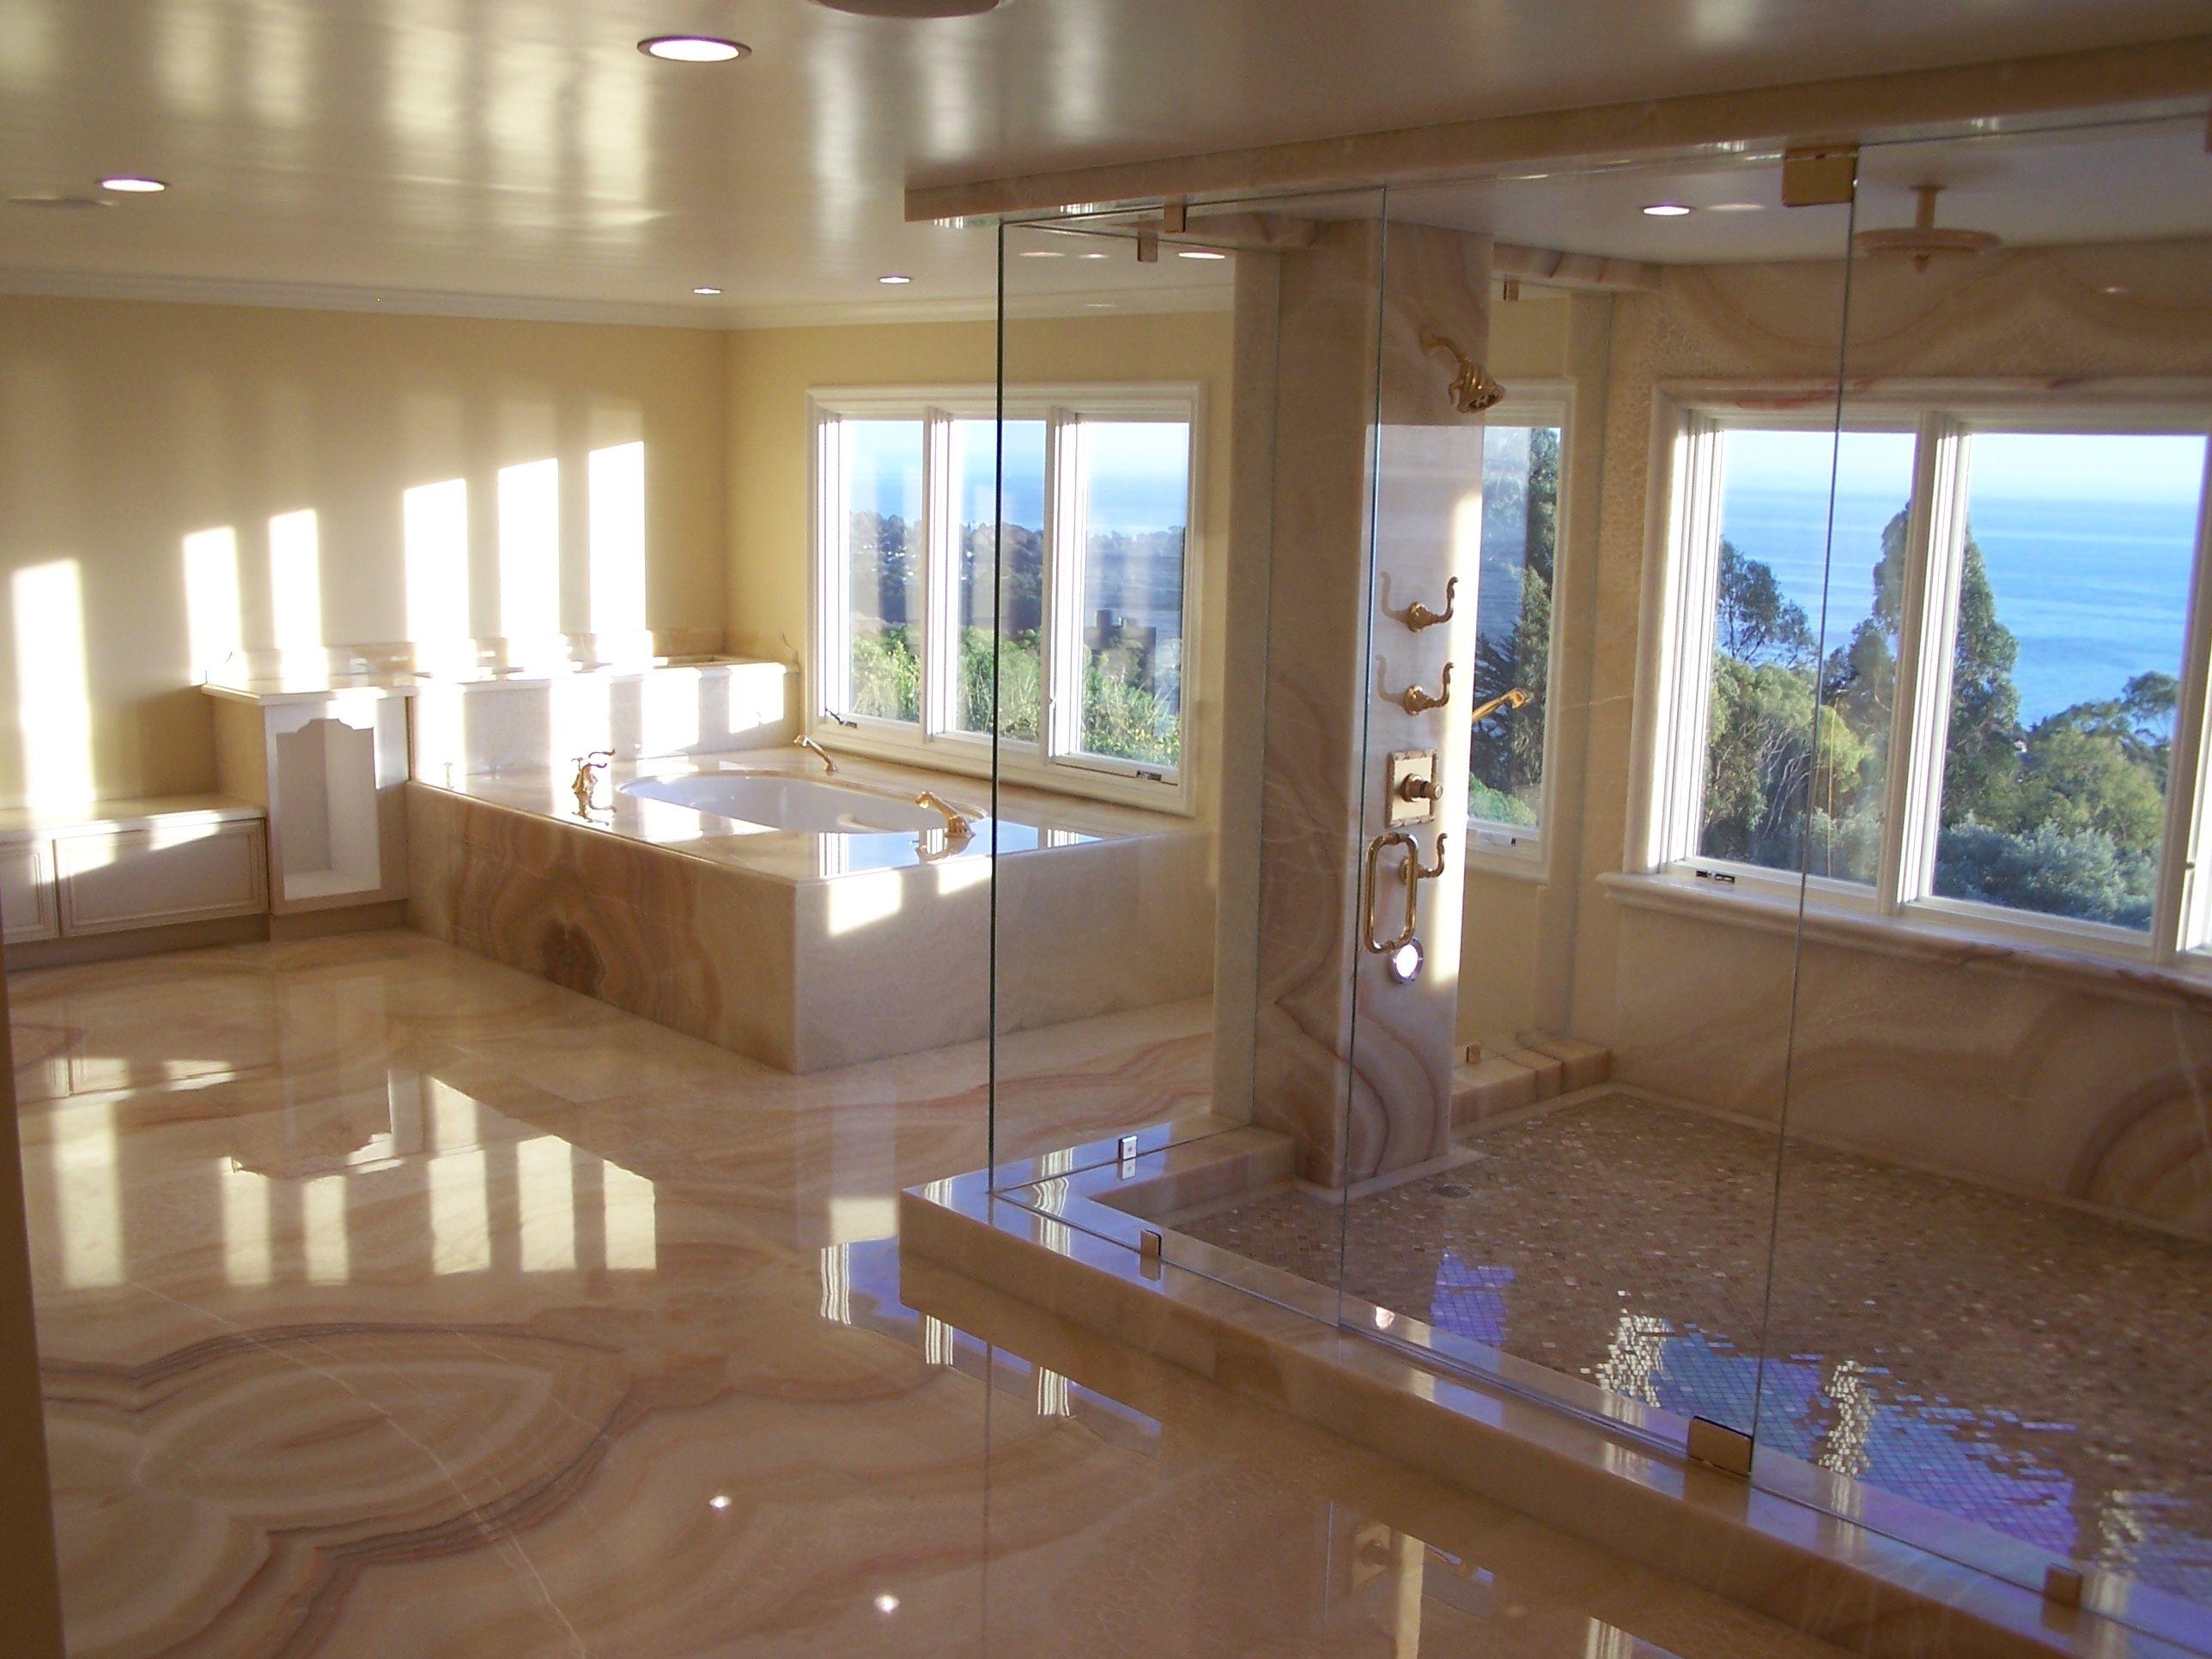 Luxury bathroom shower designs - Dream Bathrooms